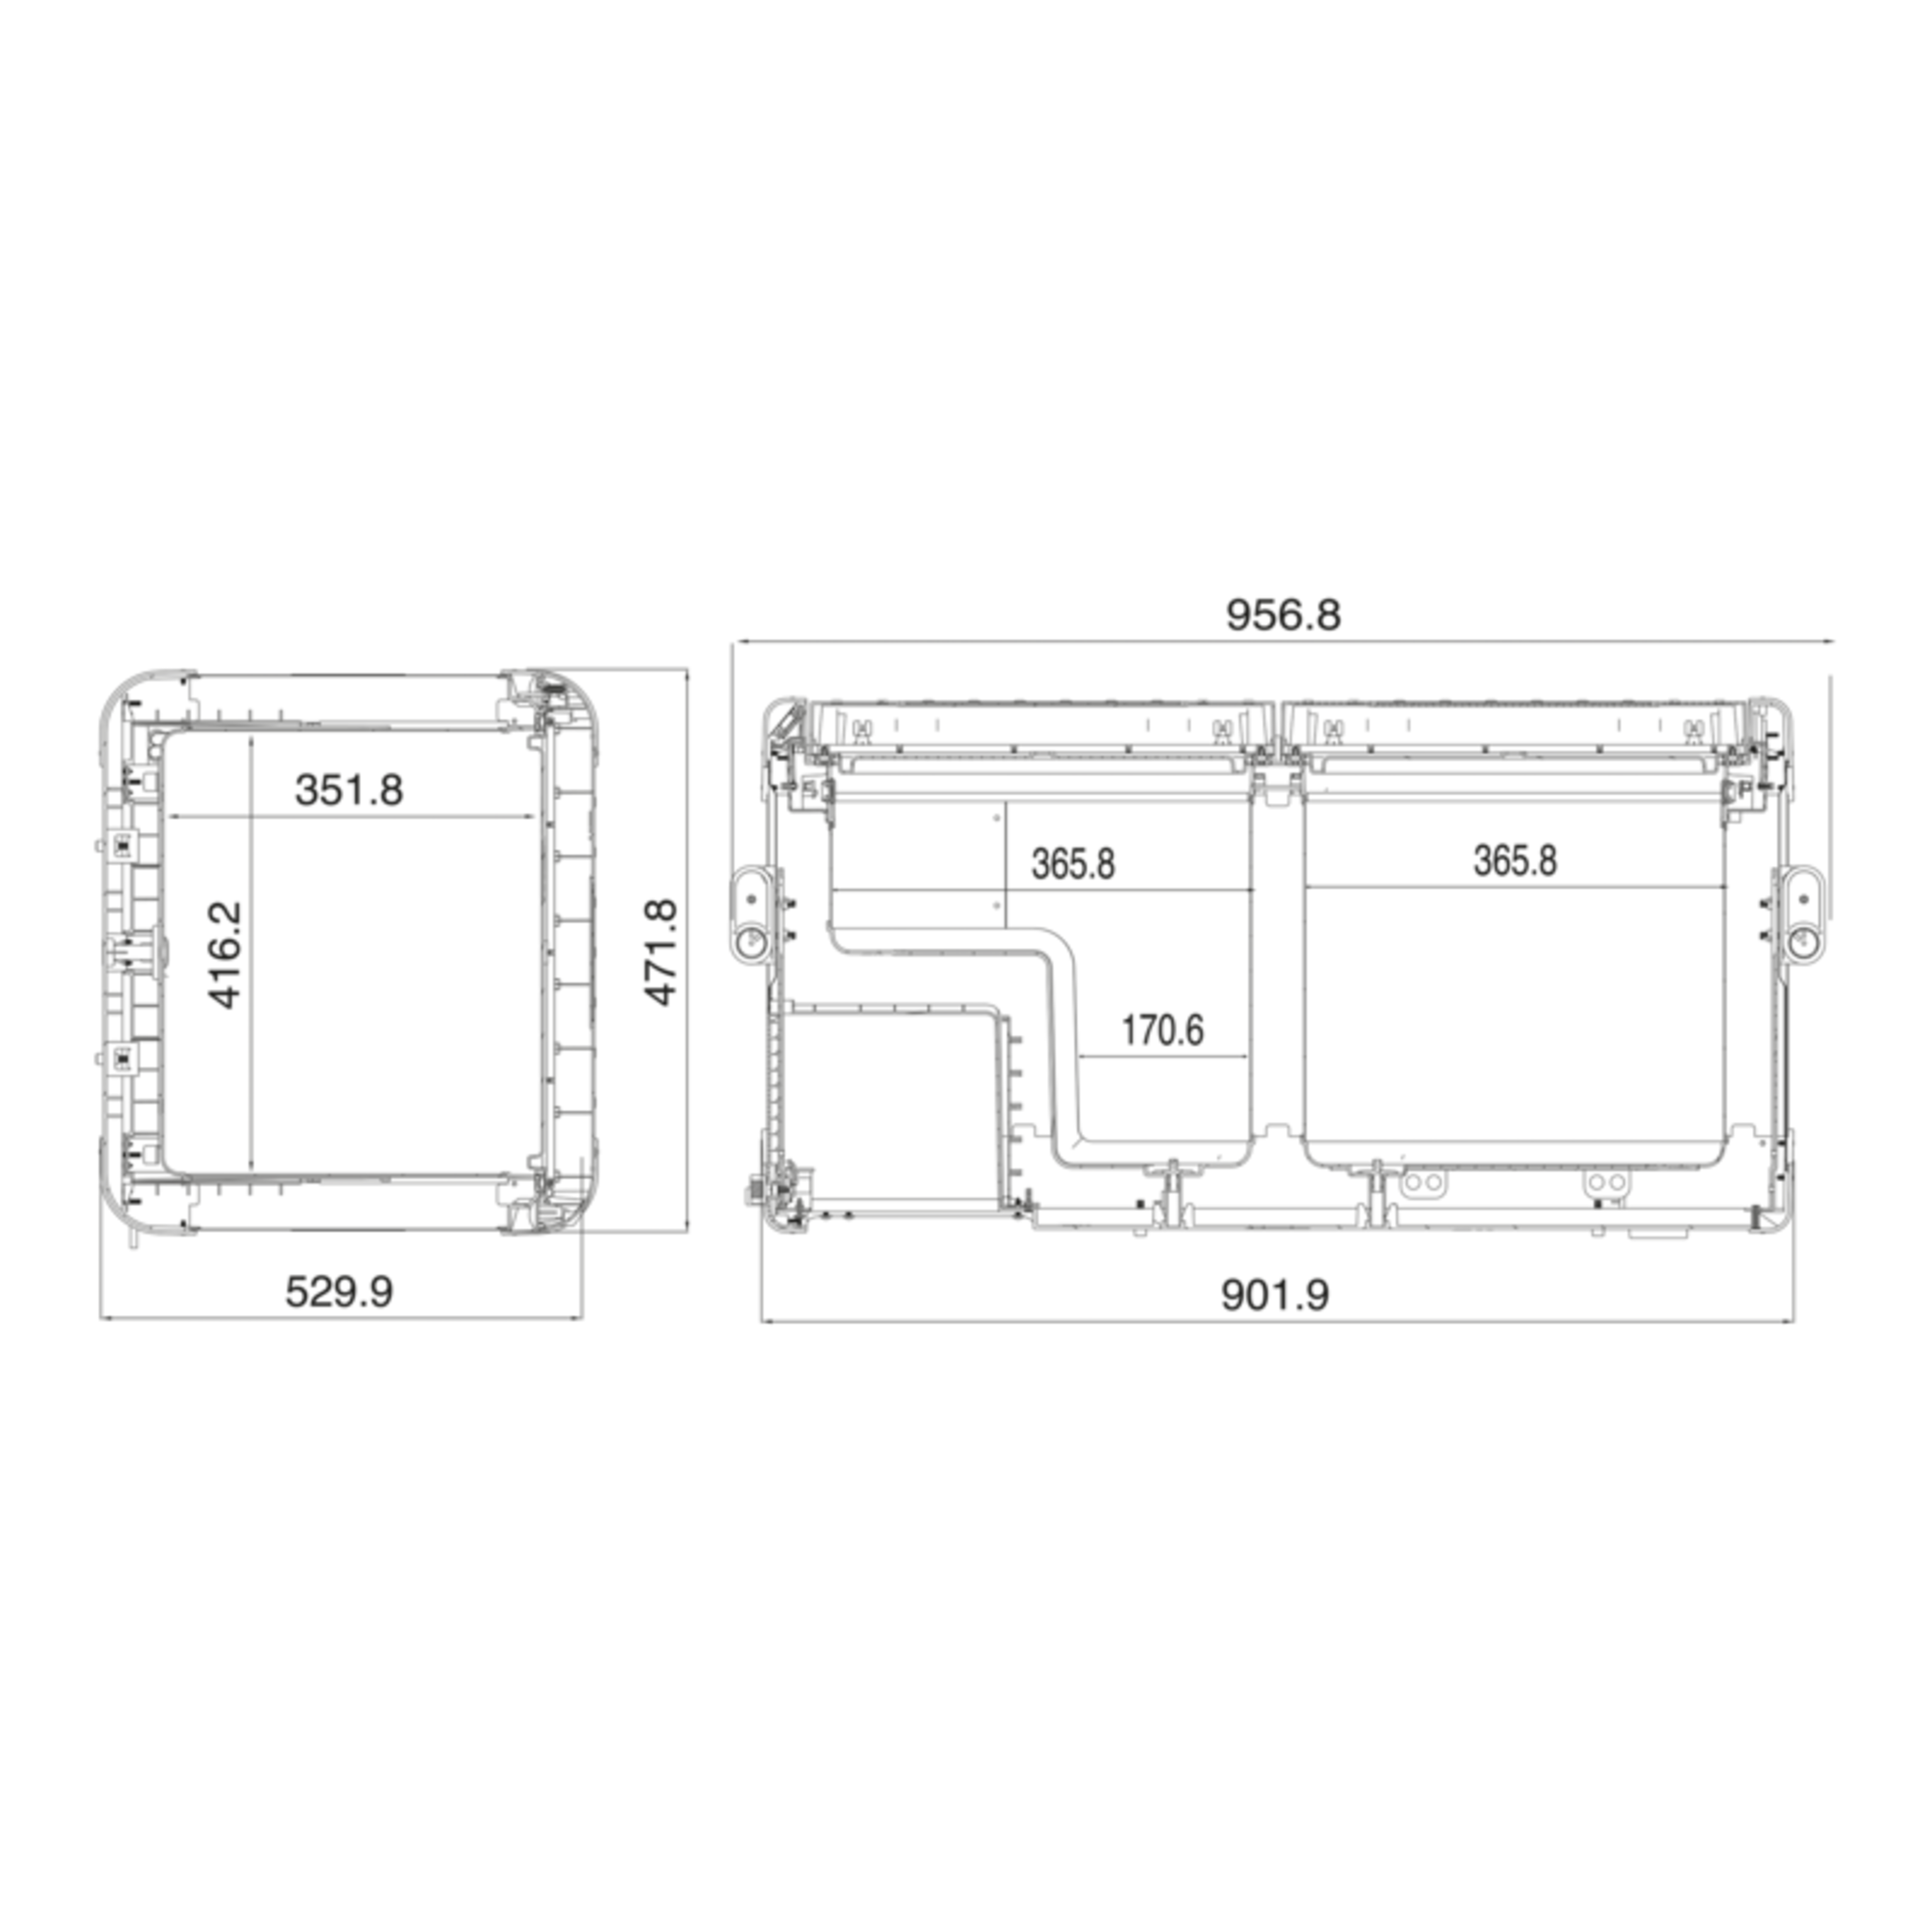 CFX 95 technical drawing (2)